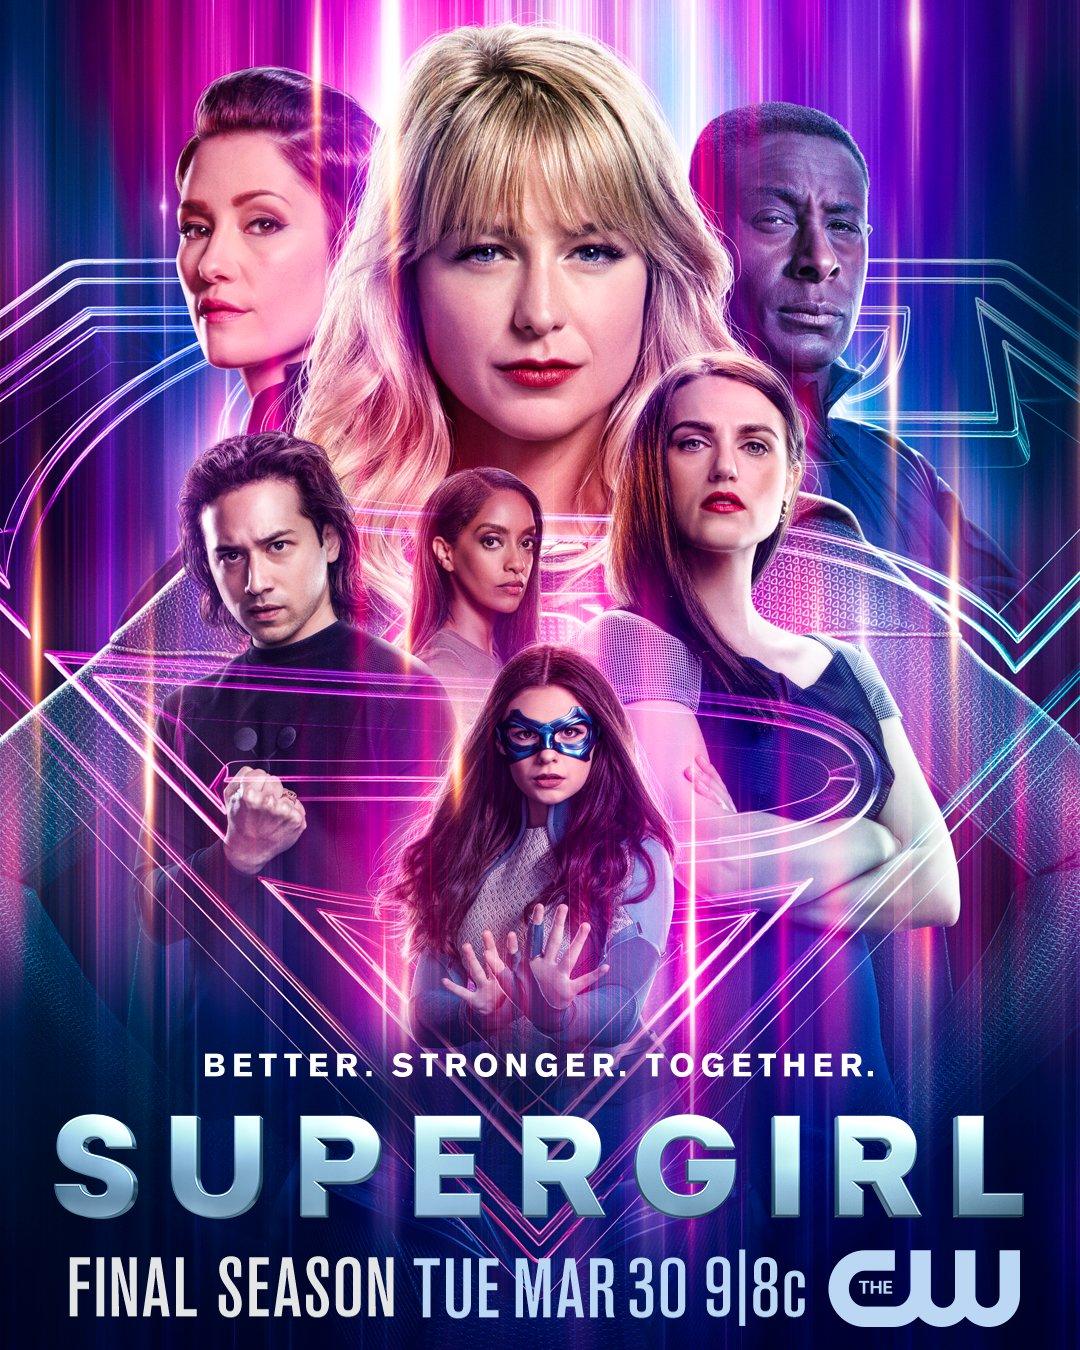 Supergirl Season 6 poster